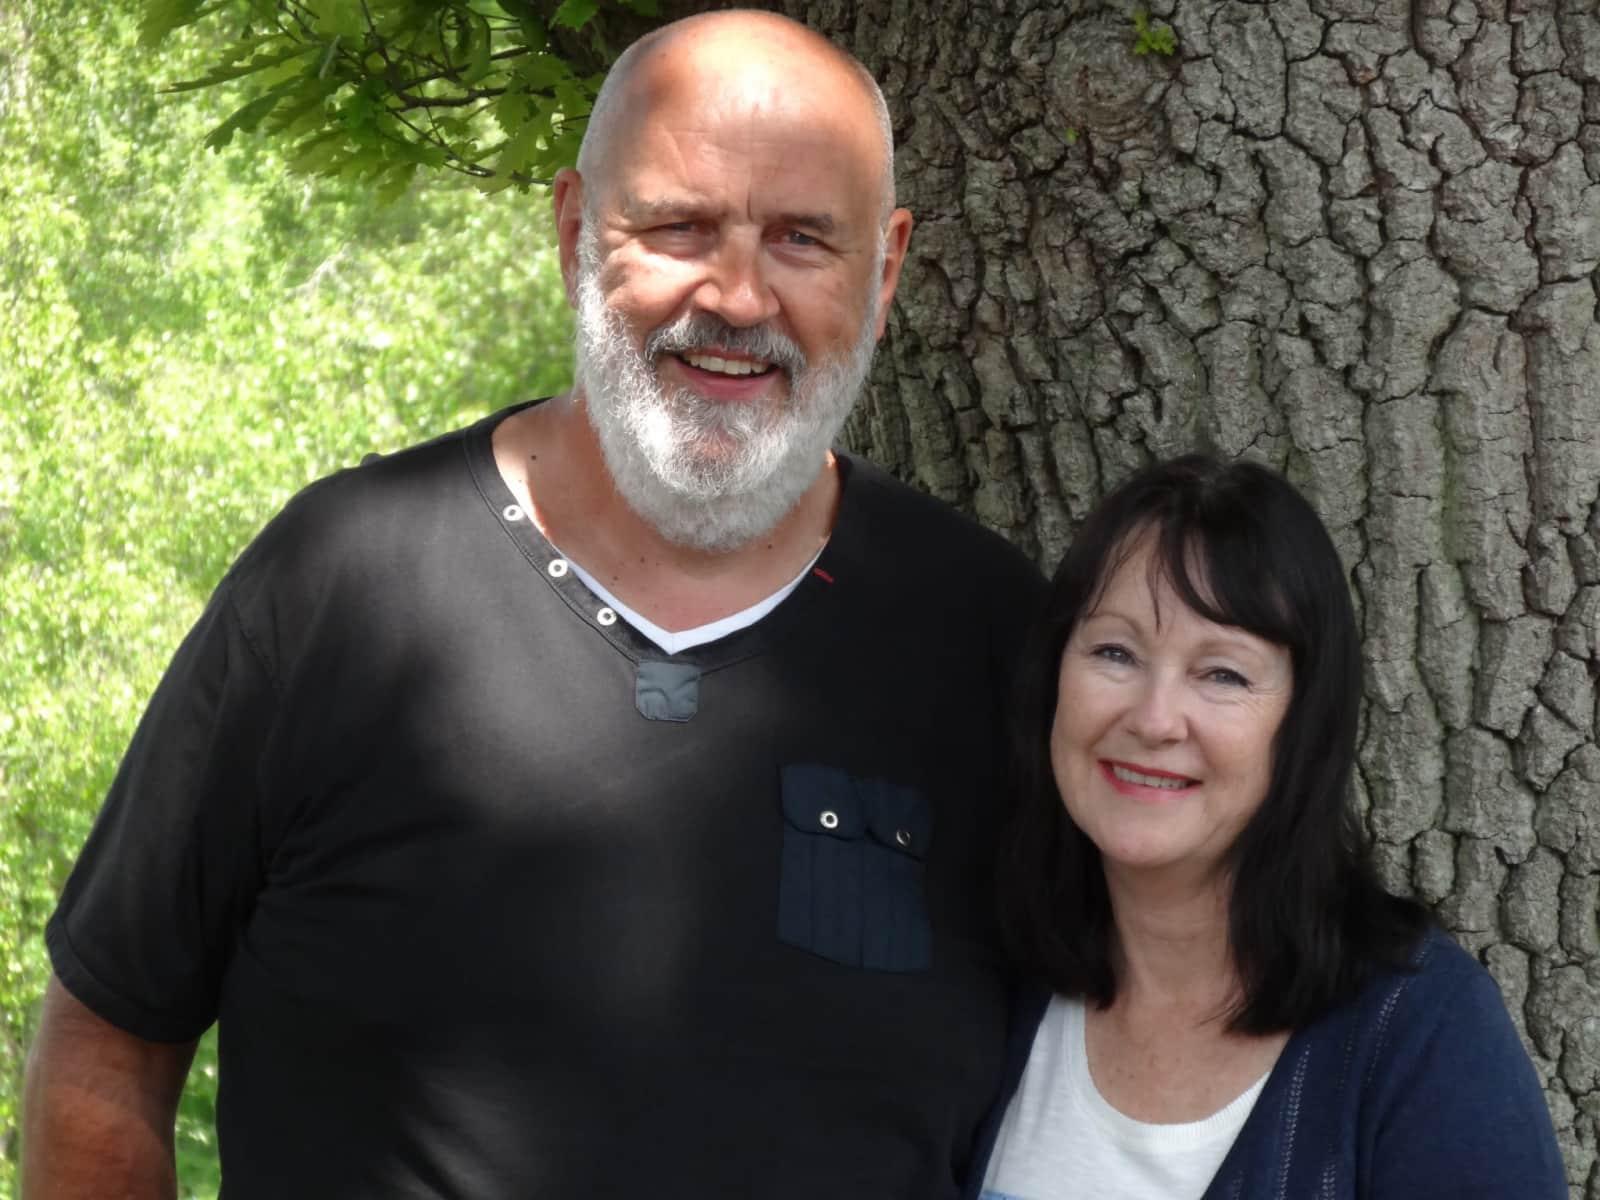 Michael & Anita from Perth, Western Australia, Australia